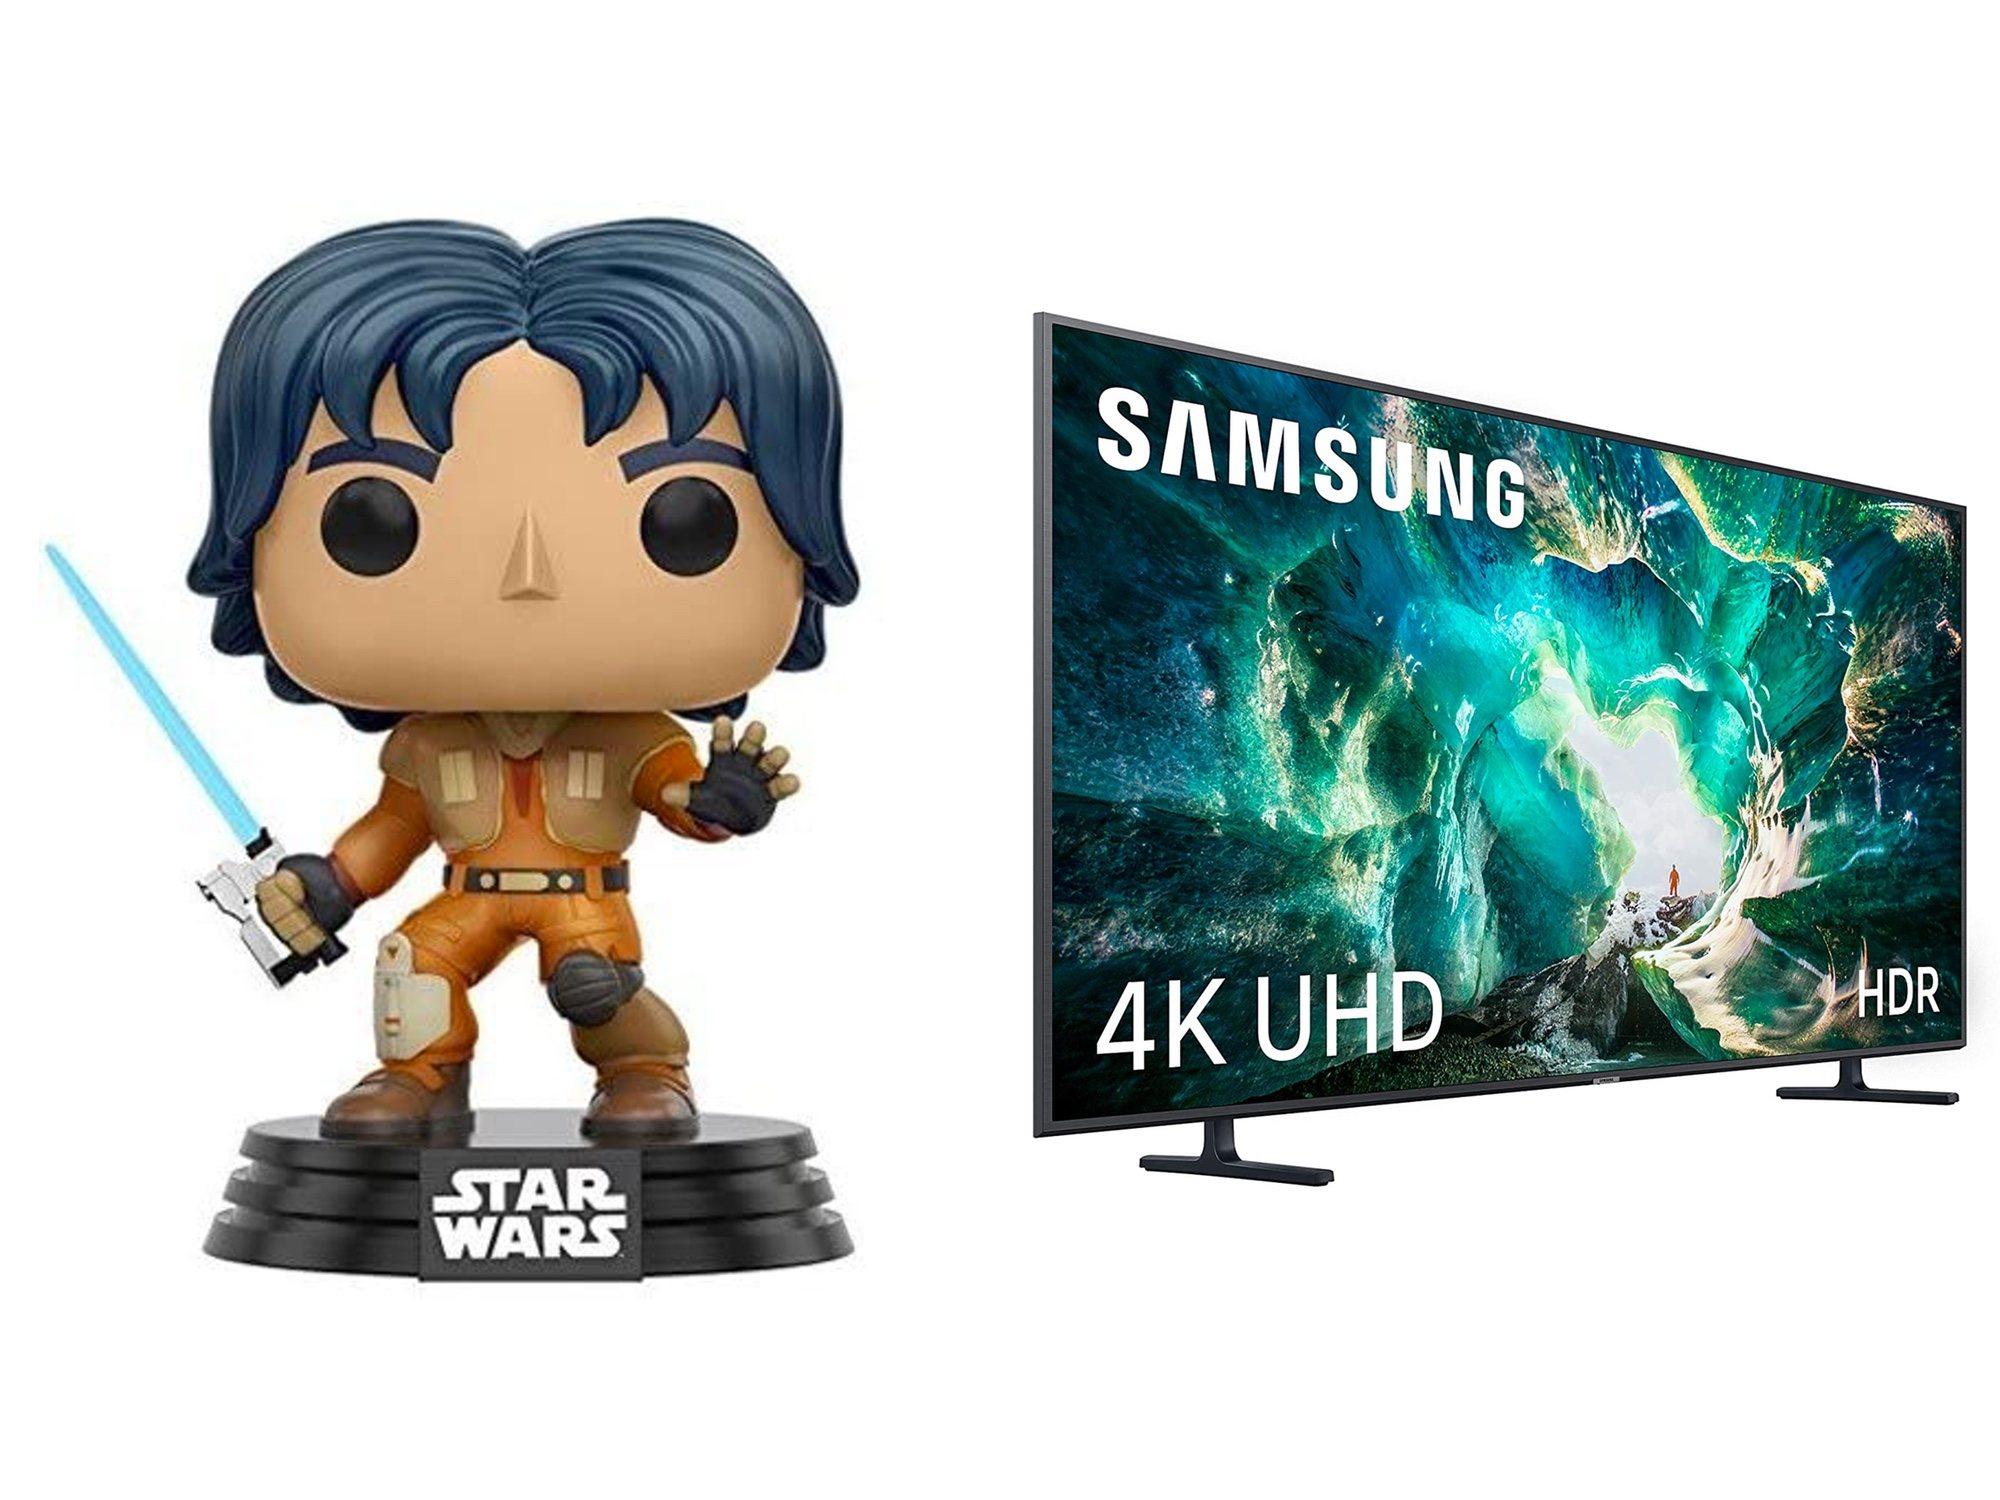 Funko d'Ezra de 'Star Wars: Rebels' et Samsung Smart TV 55 '